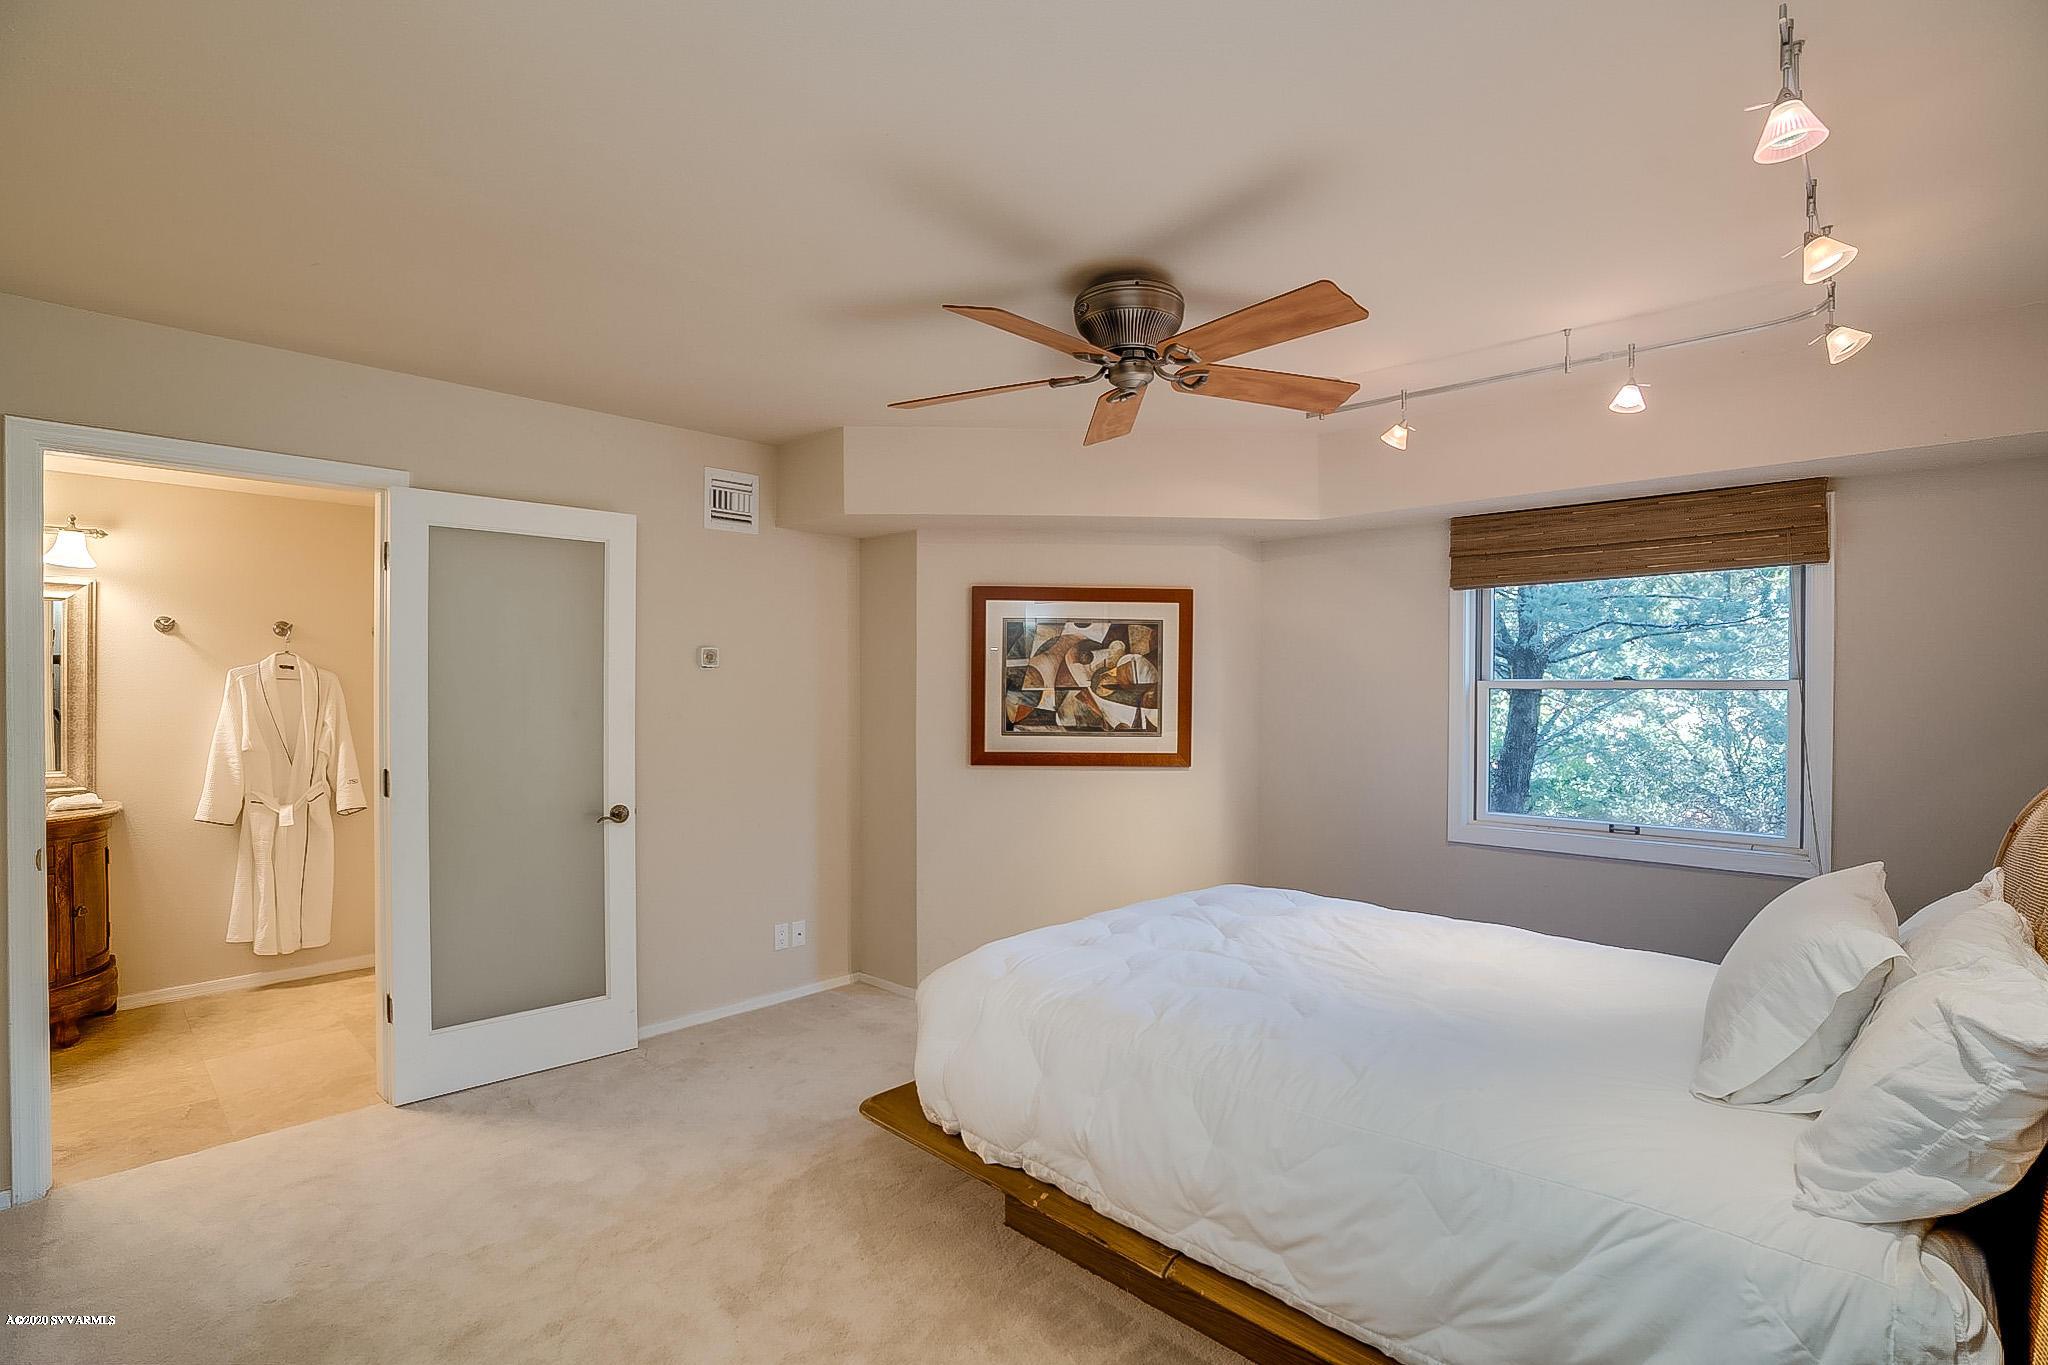 86 Linda Vista Sedona, AZ 86336